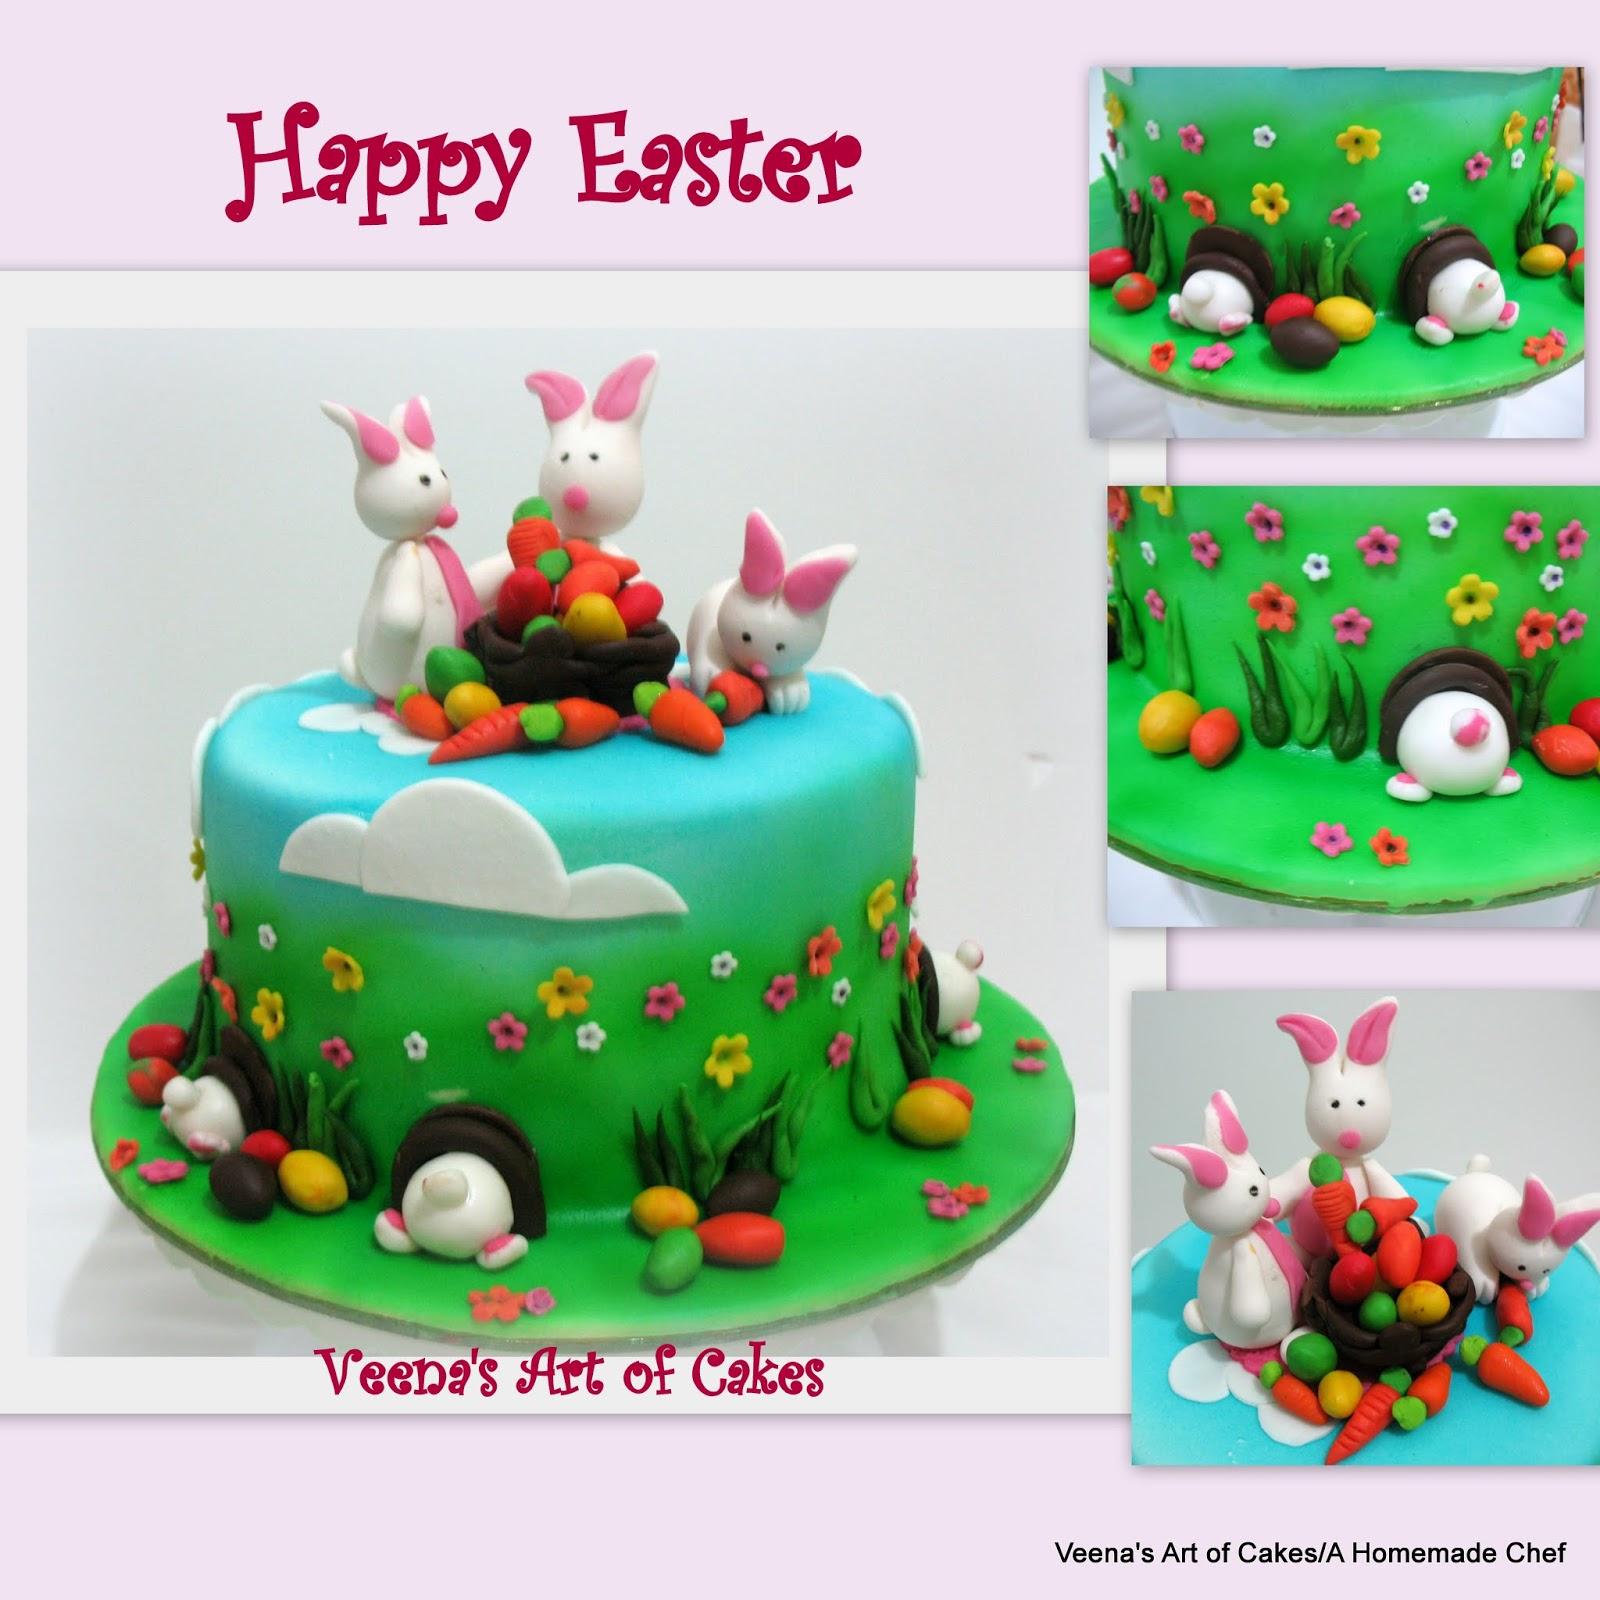 Easter Cake with Easter Bunnies - Veena Azmanov